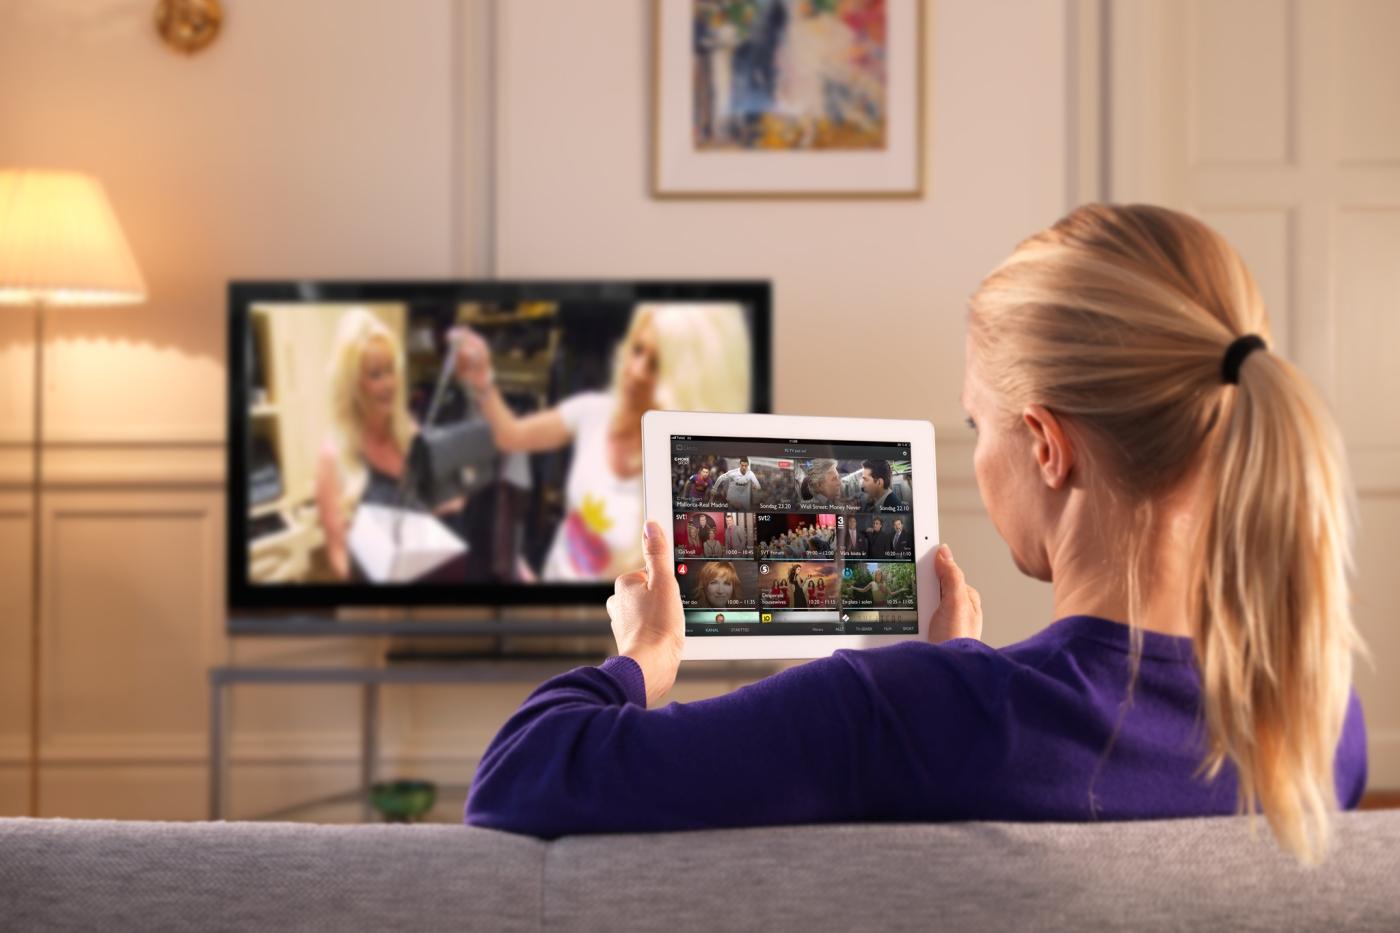 digital-entertainment-post-social-tv-second-screen